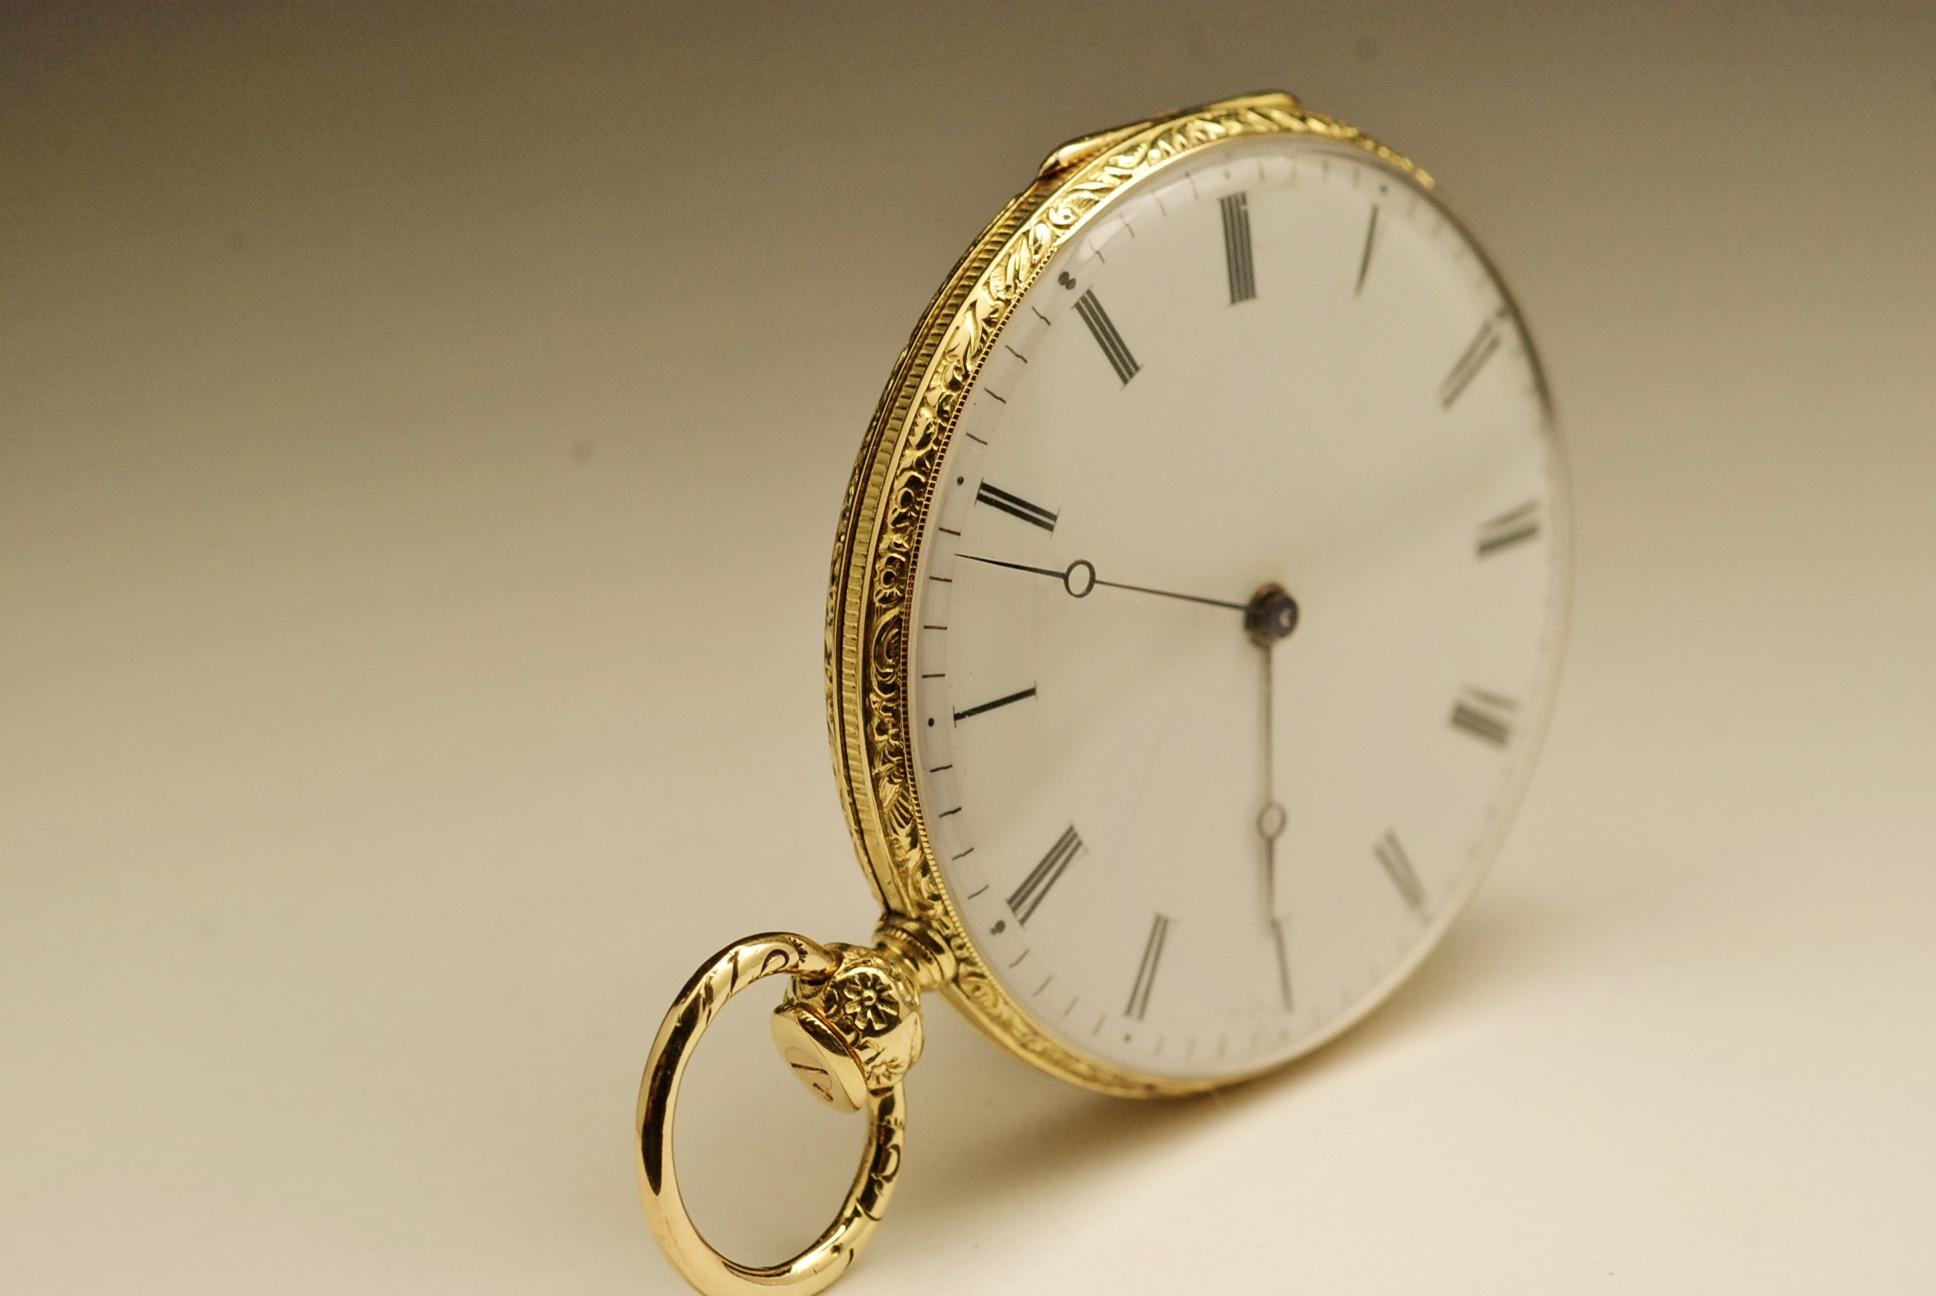 ancienne montre gousset r p tition sonnerie or 18k 1840. Black Bedroom Furniture Sets. Home Design Ideas